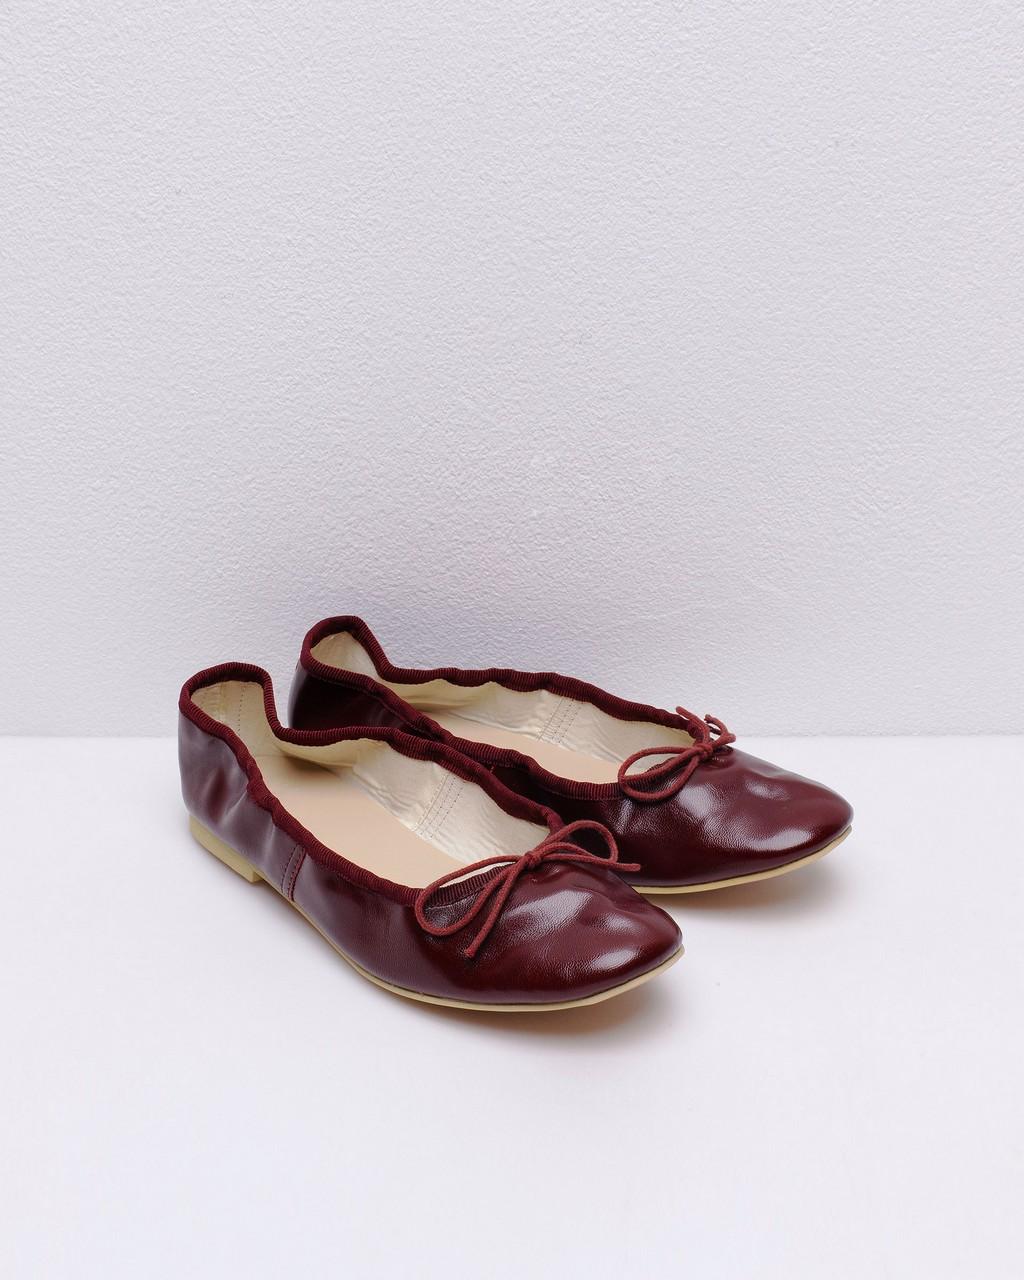 Tagtraume E.Ballerina - Brown(브라운)